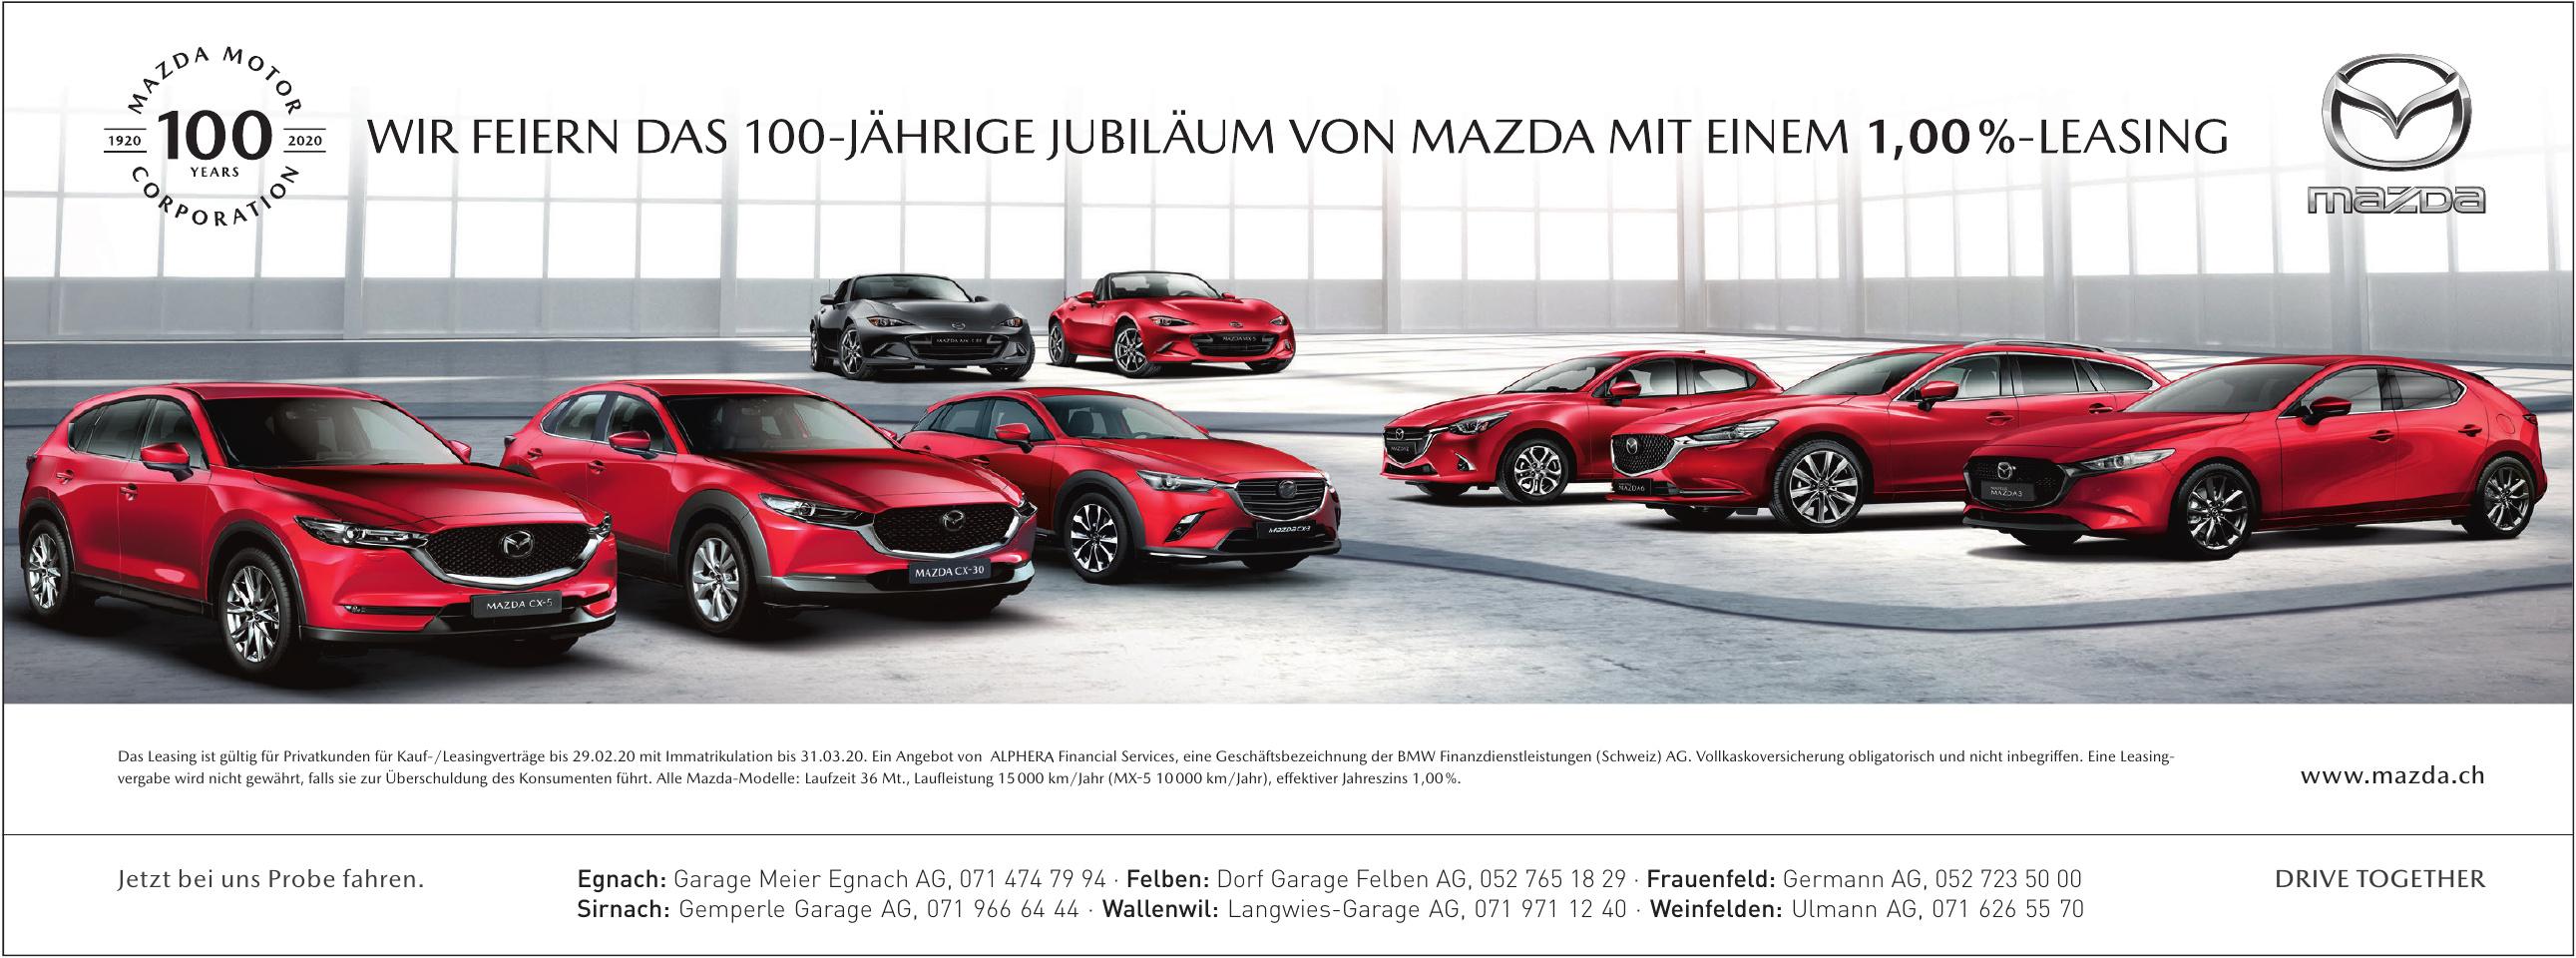 Mazda - Garage Meier Egnach AG